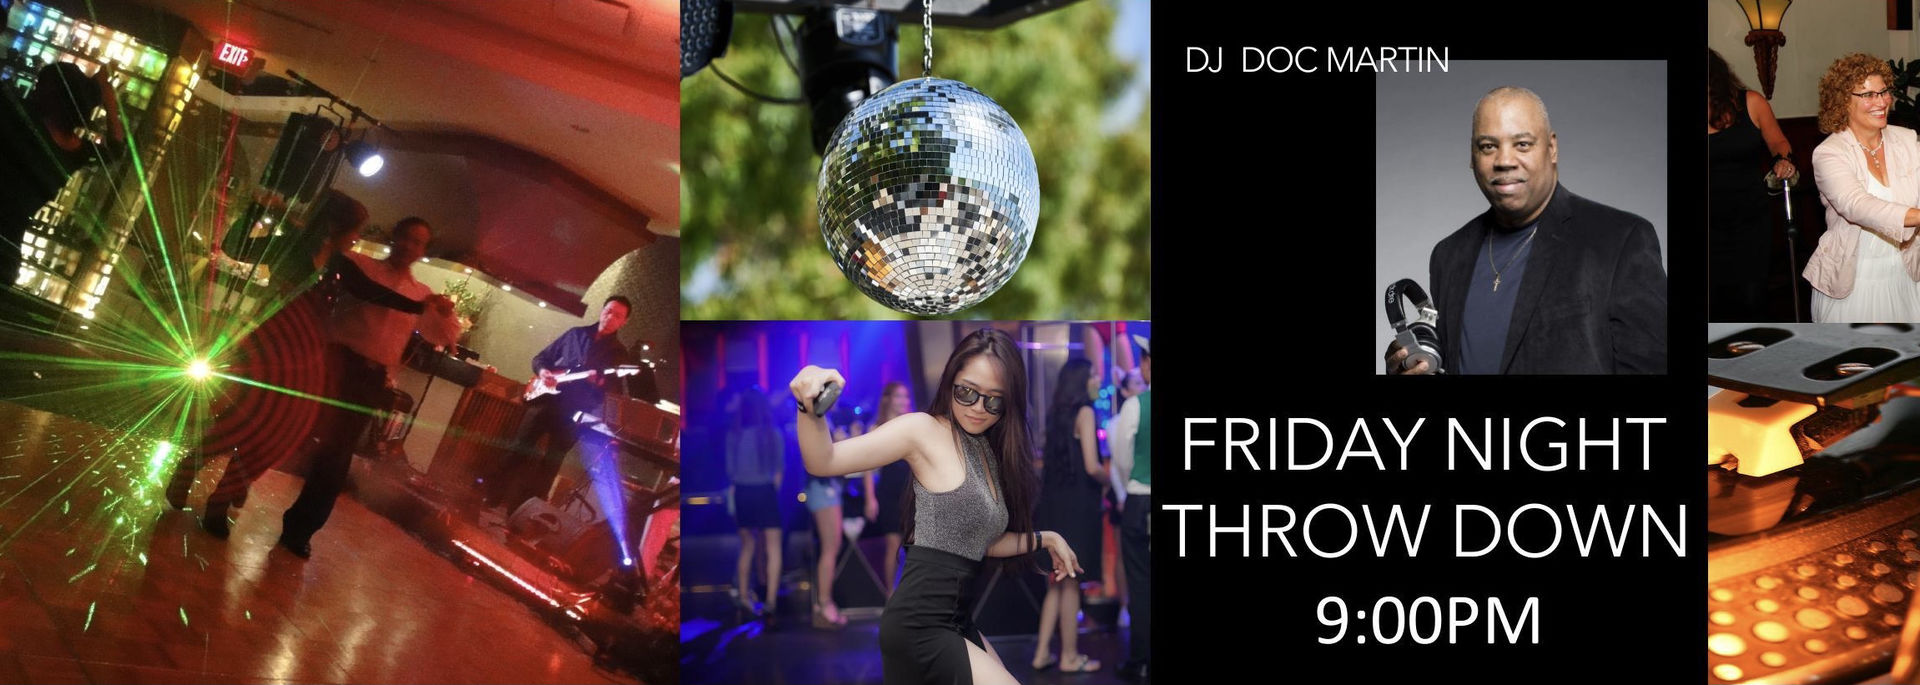 The Friday Night Throwdown